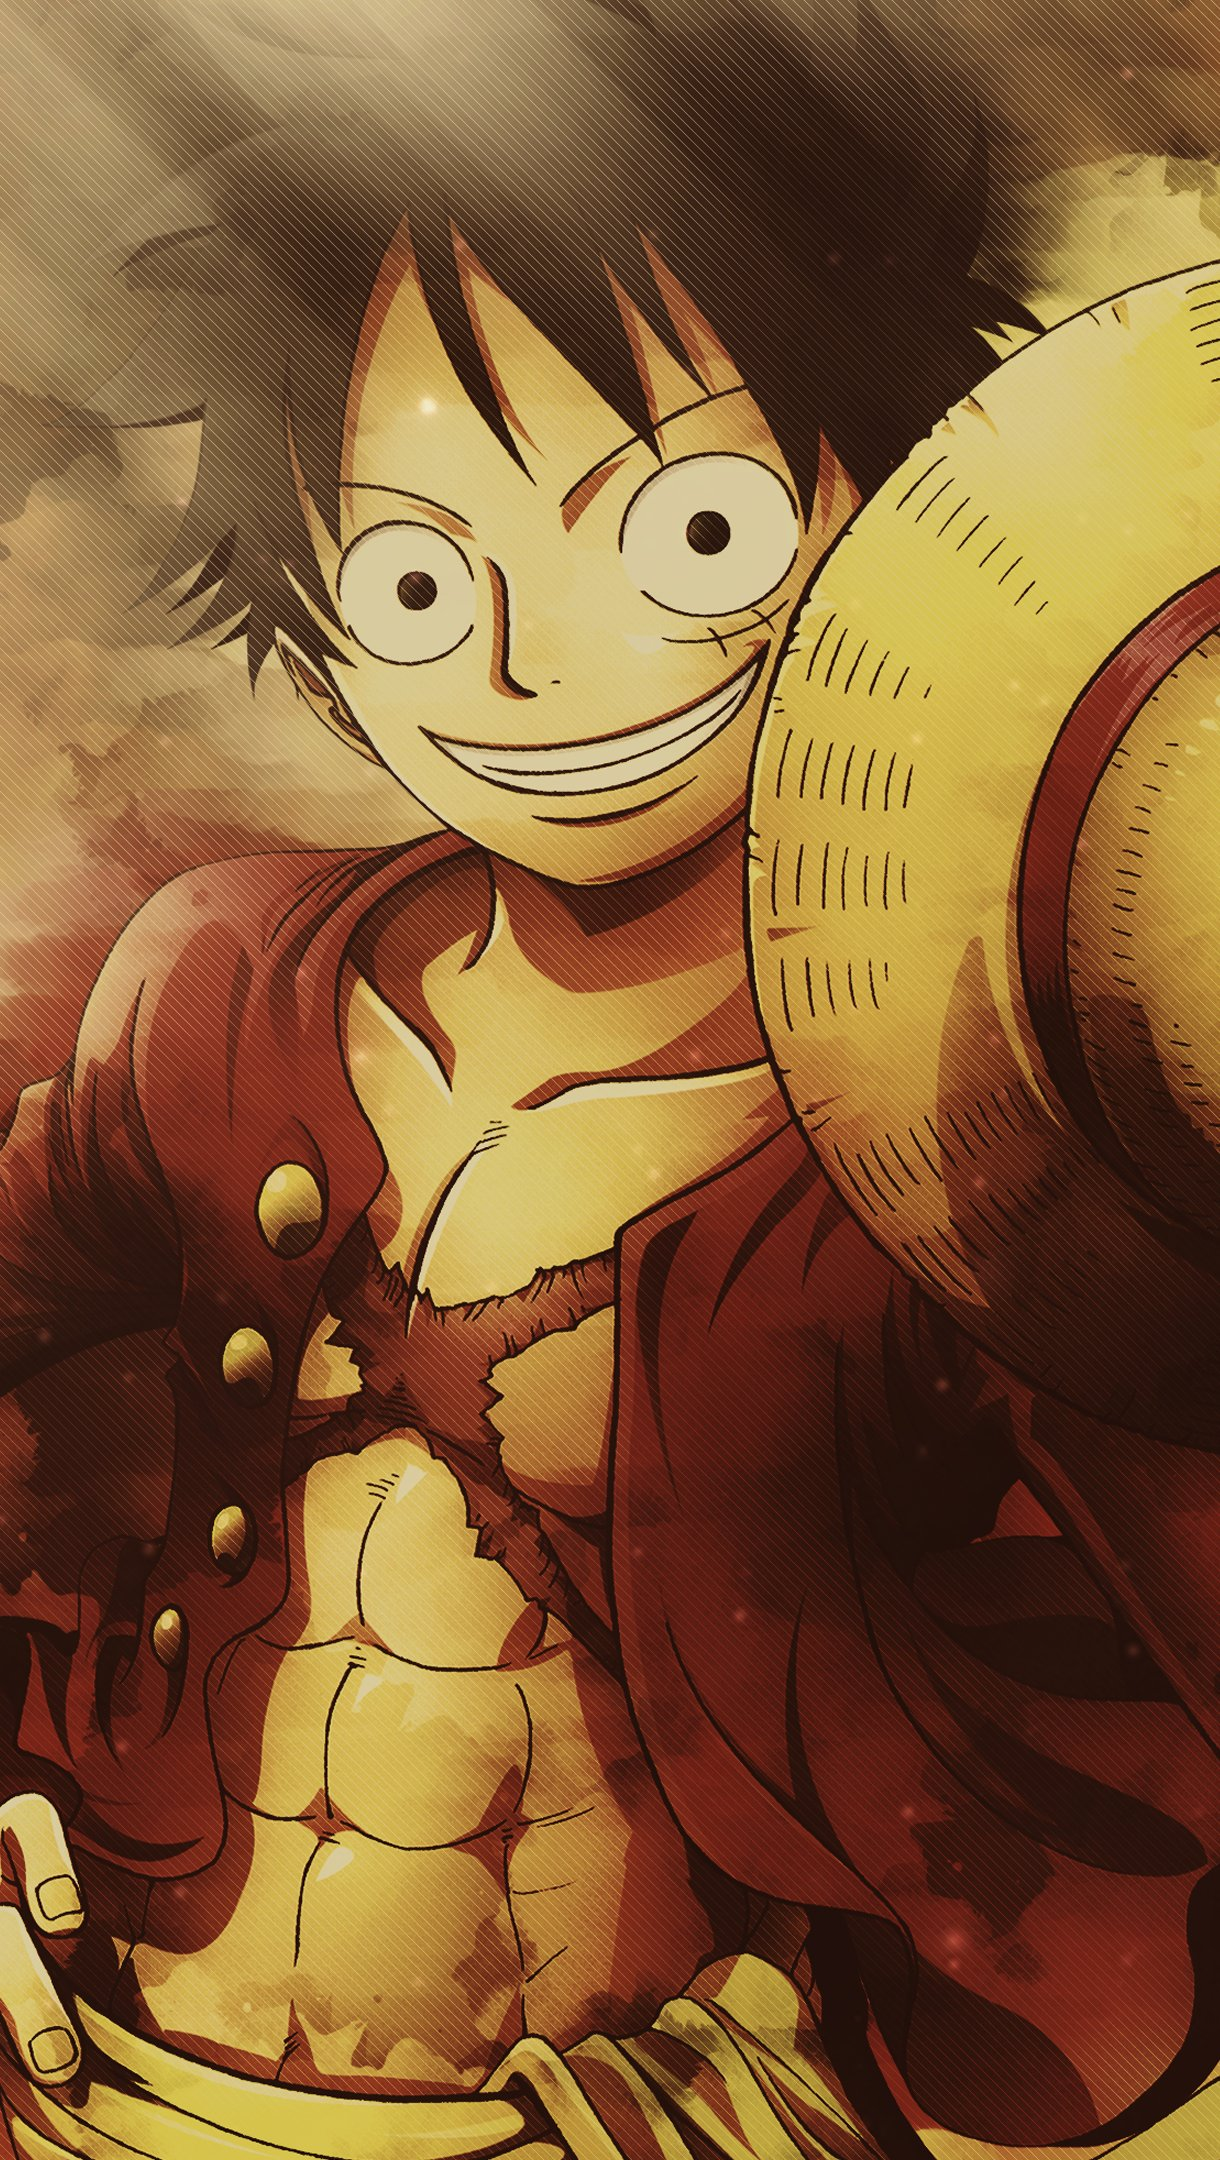 Monkey D. Luffy de One Piece Anime Fondo de pantalla 4k ...